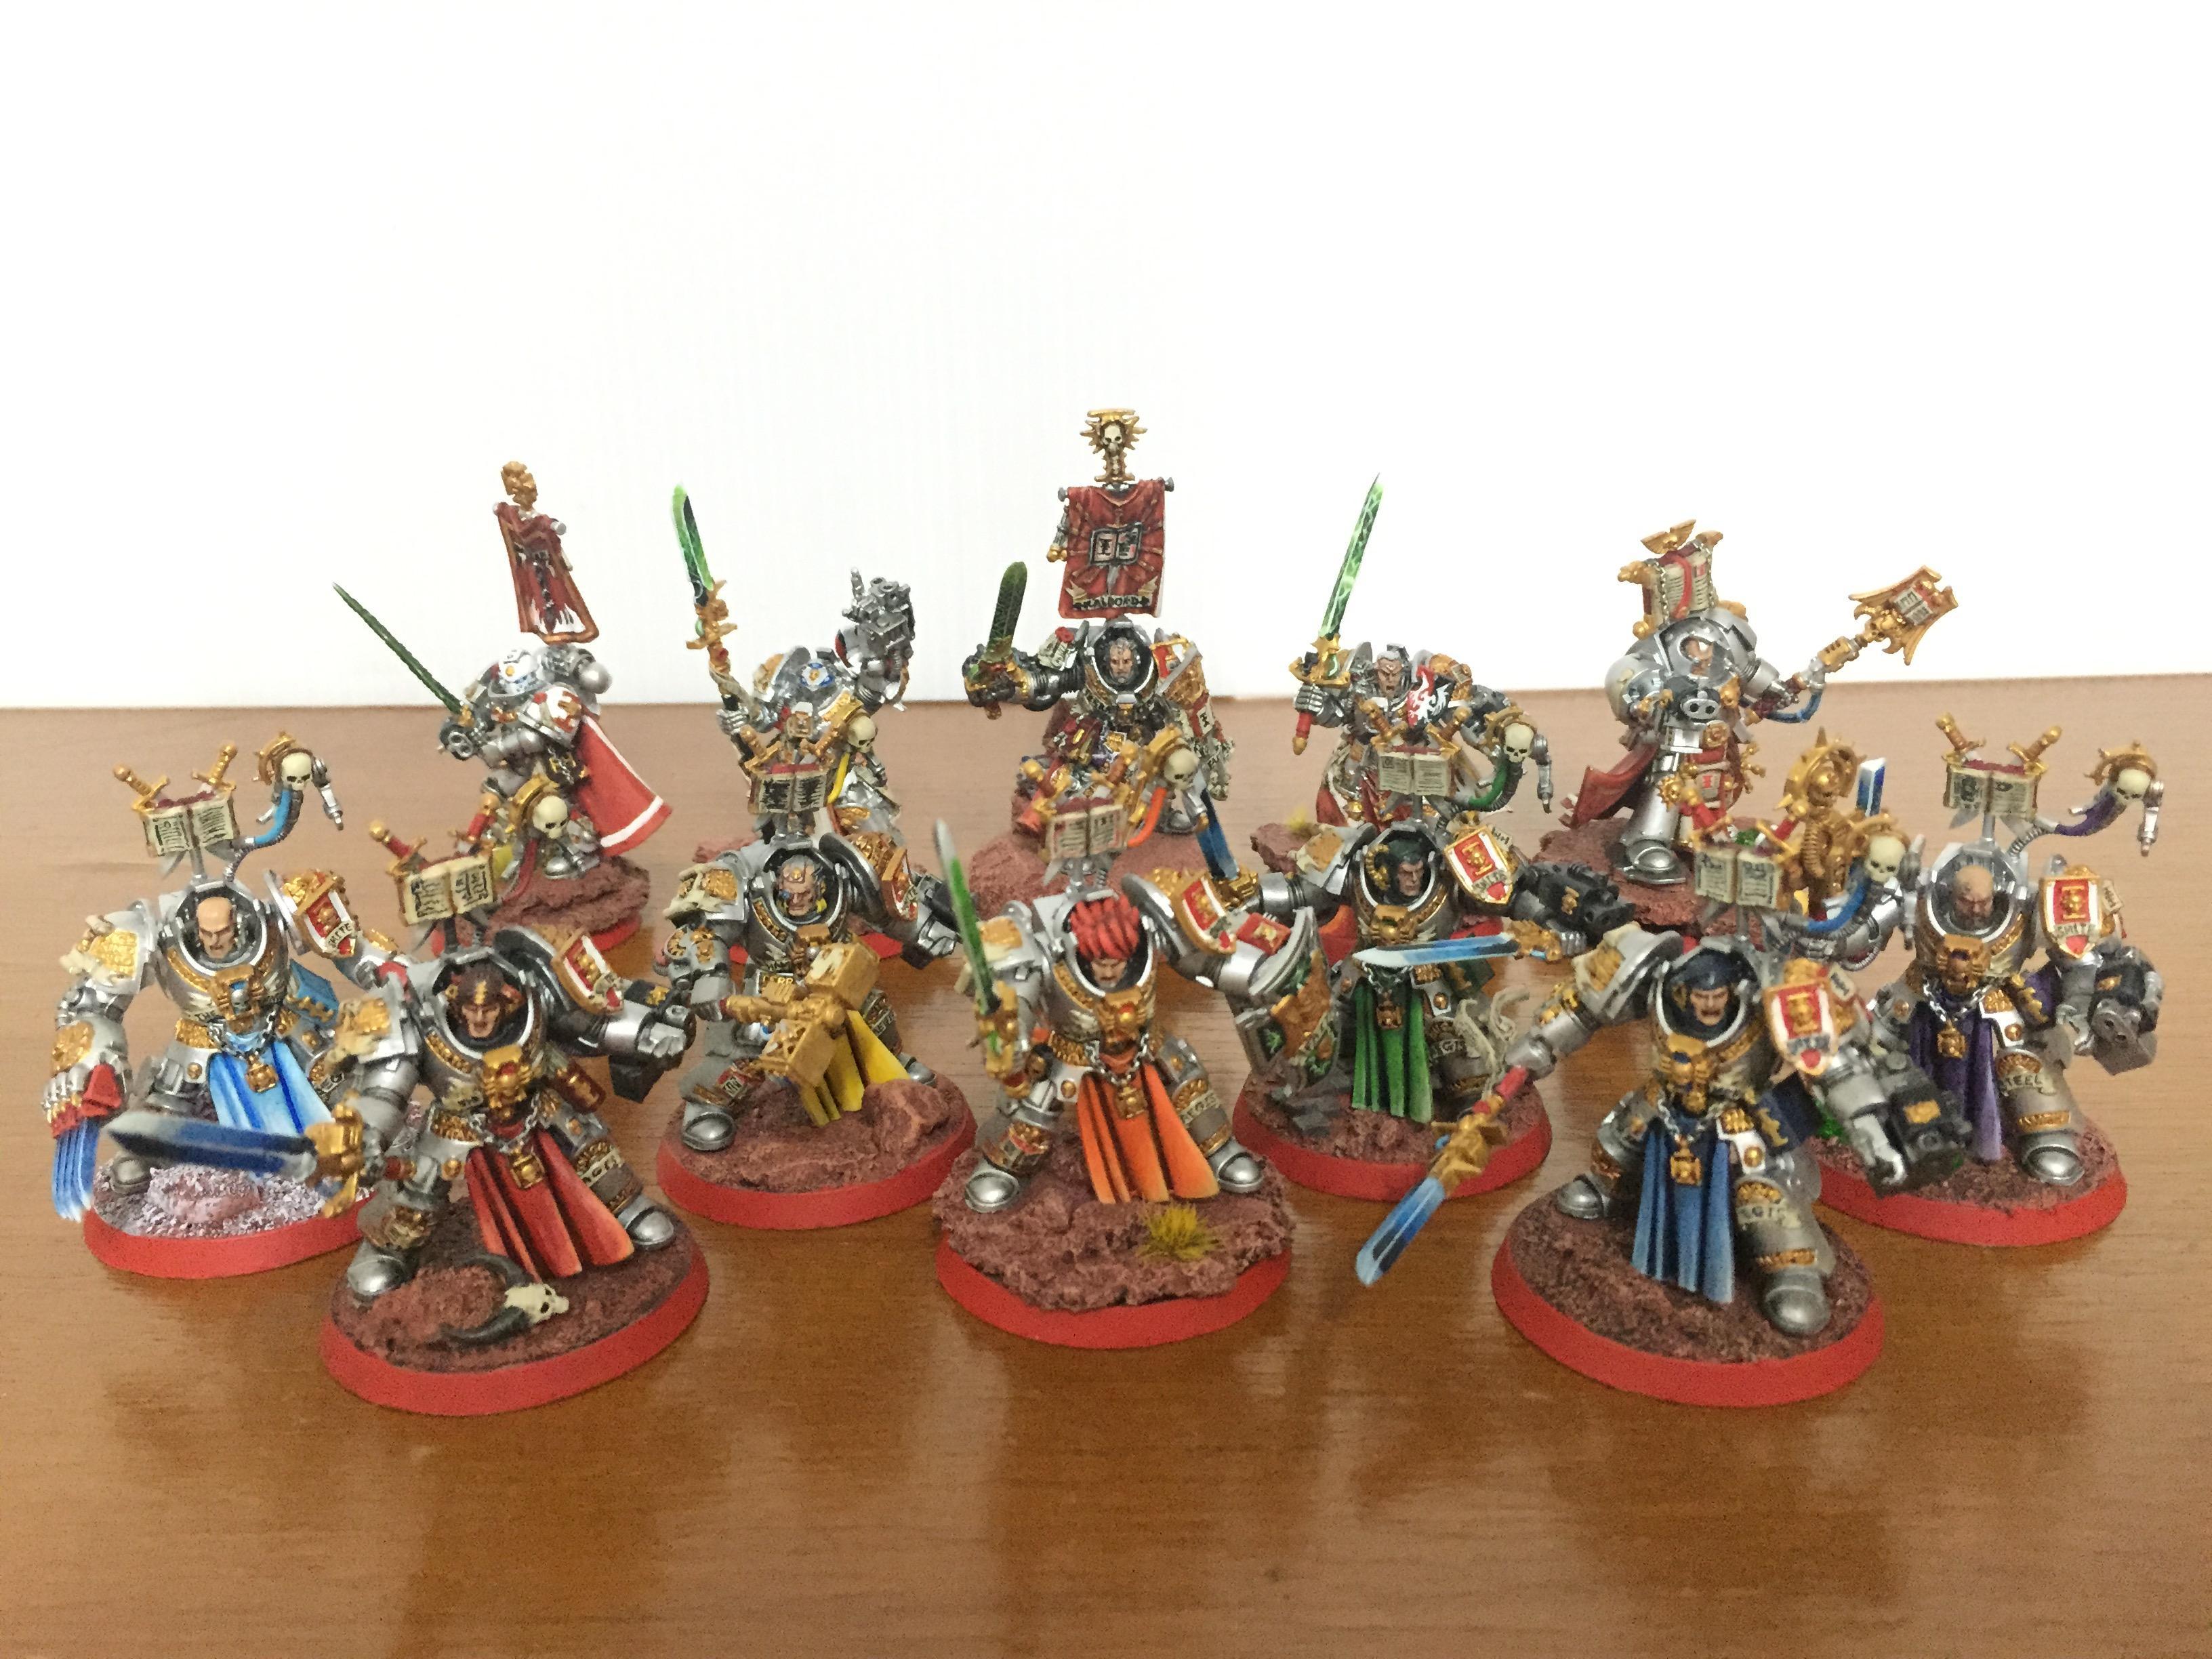 Brother, Captain, Castellan, Crowe, Draigo, Grey Knights, Justicar, Librarian, Lord Kaldor Draigo, Paladin, Stern